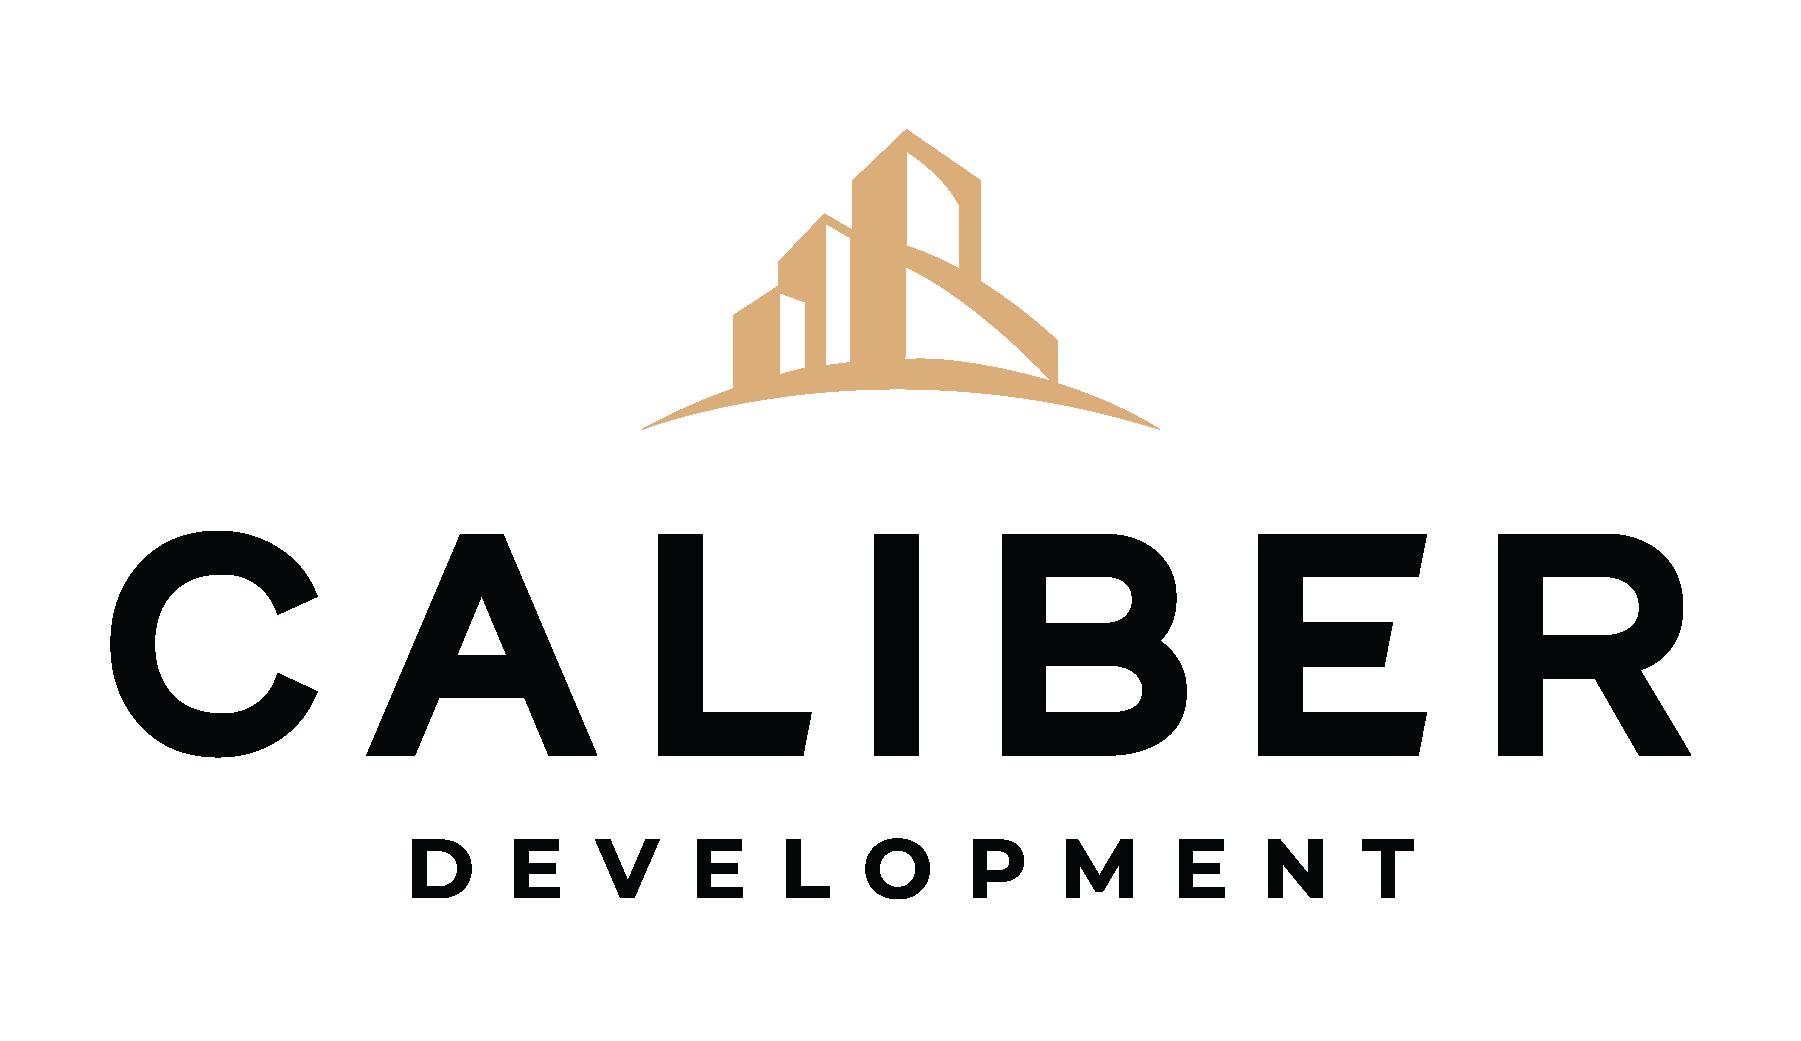 Caliber-Development-MAIN-LOGO-COLOR-GOLD-AND-BLACK-RGB